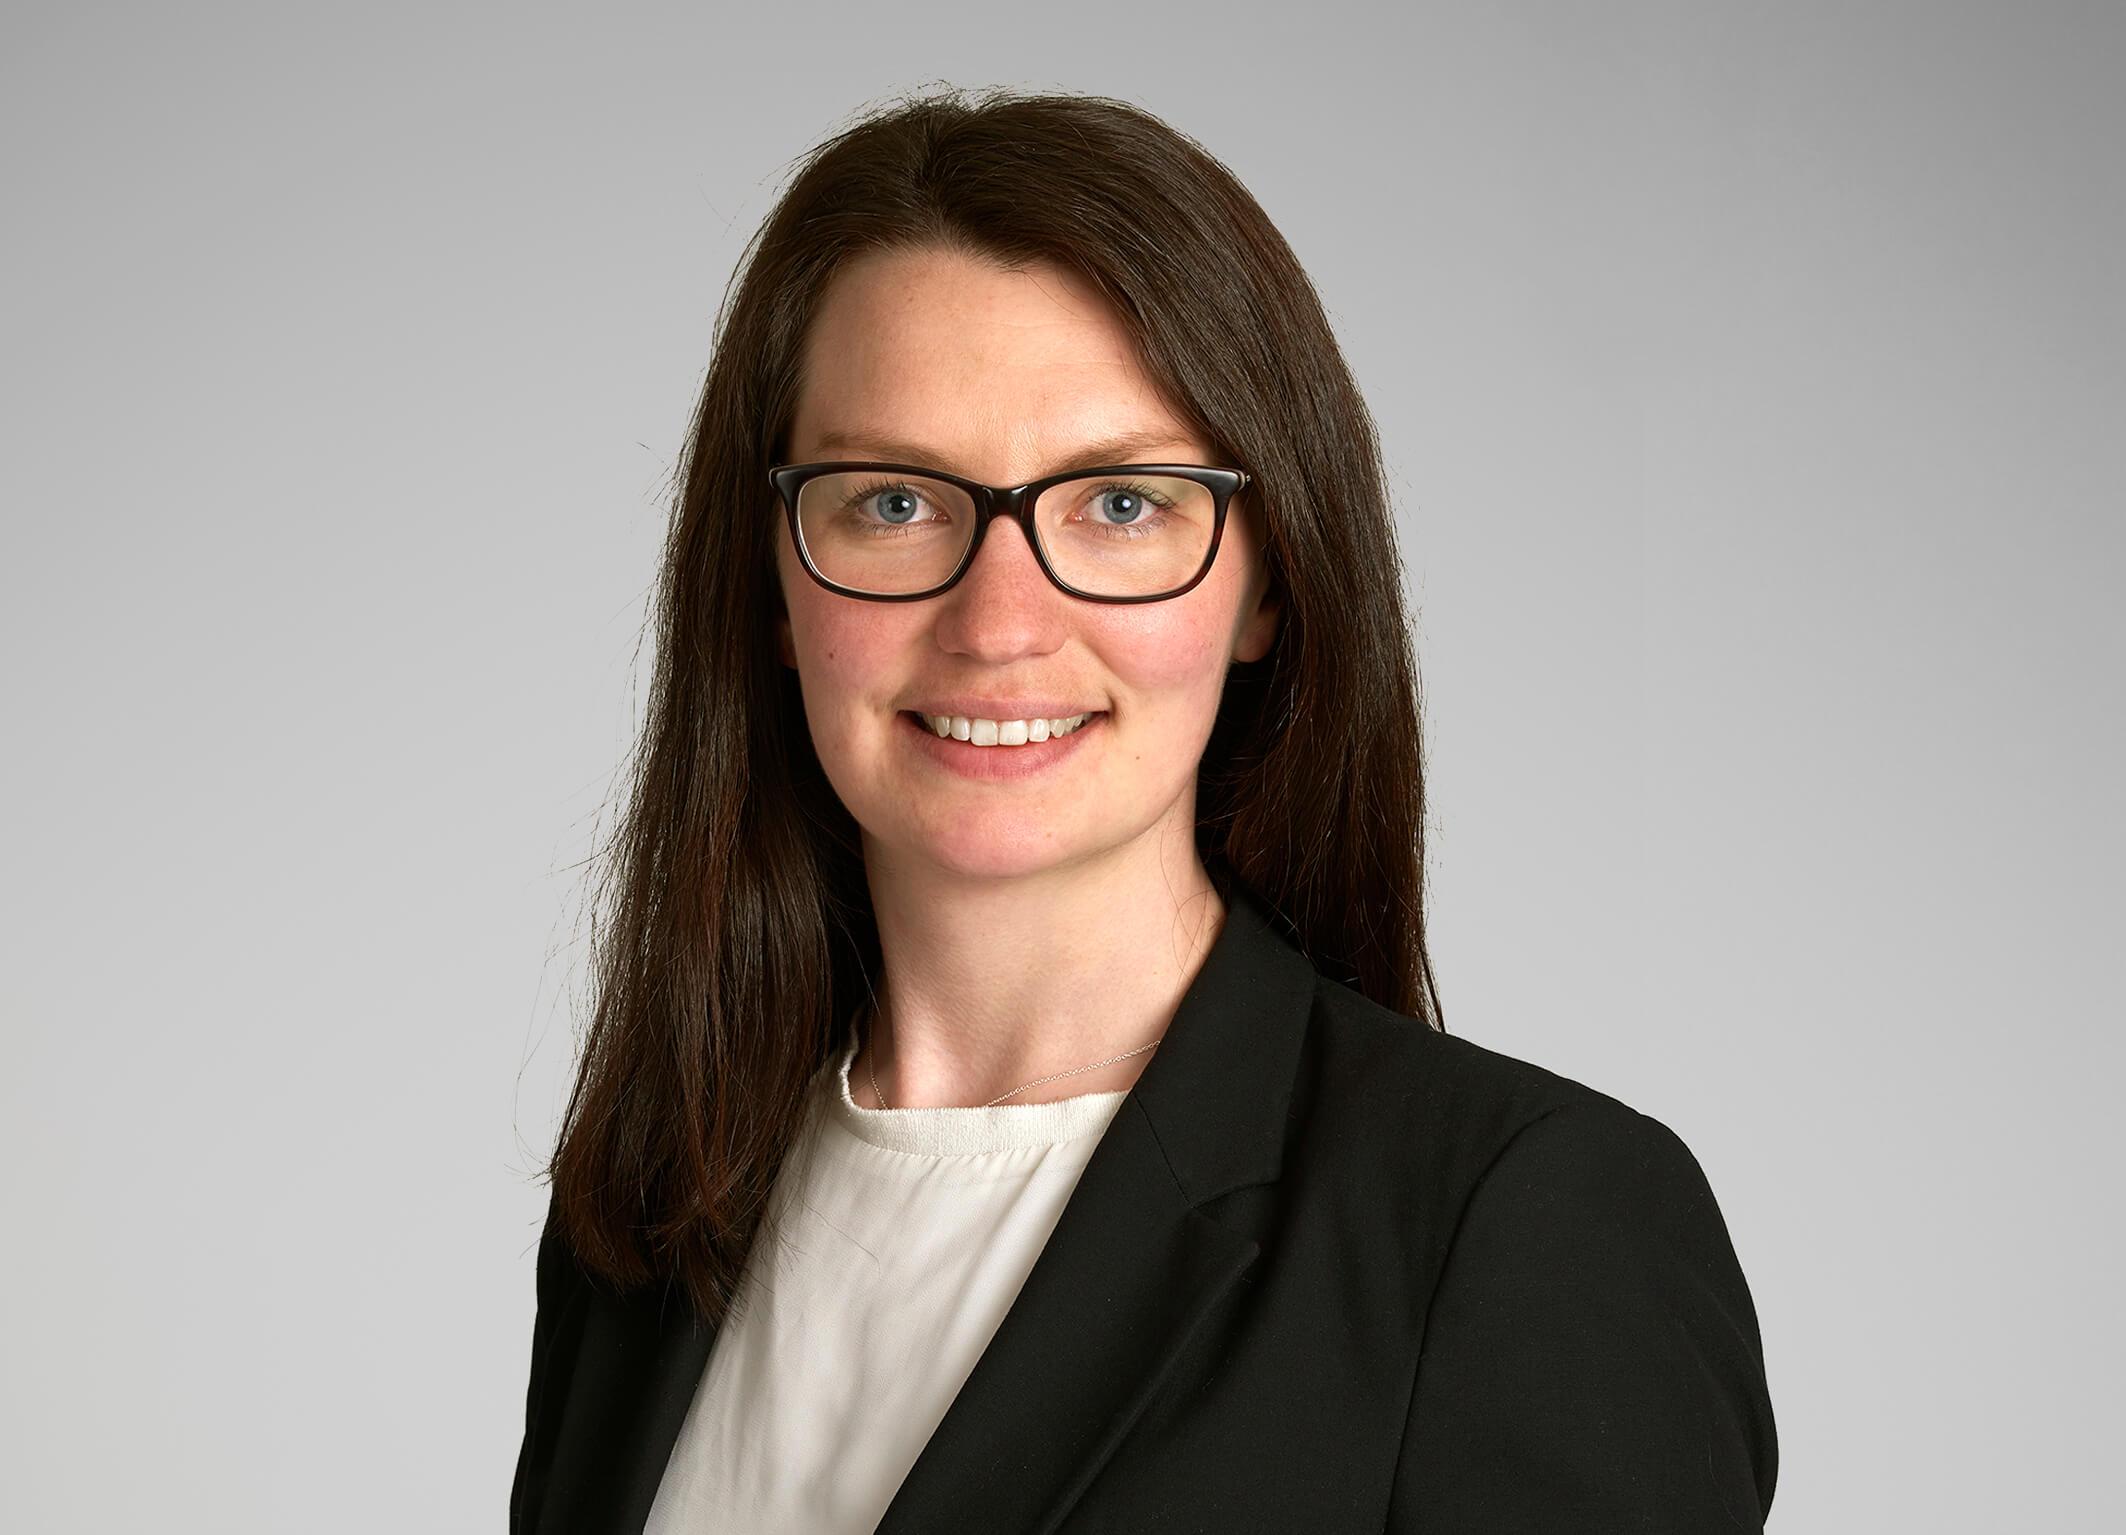 Vi gratulerer Anne Sloot Bjøru med advokatbevilling!